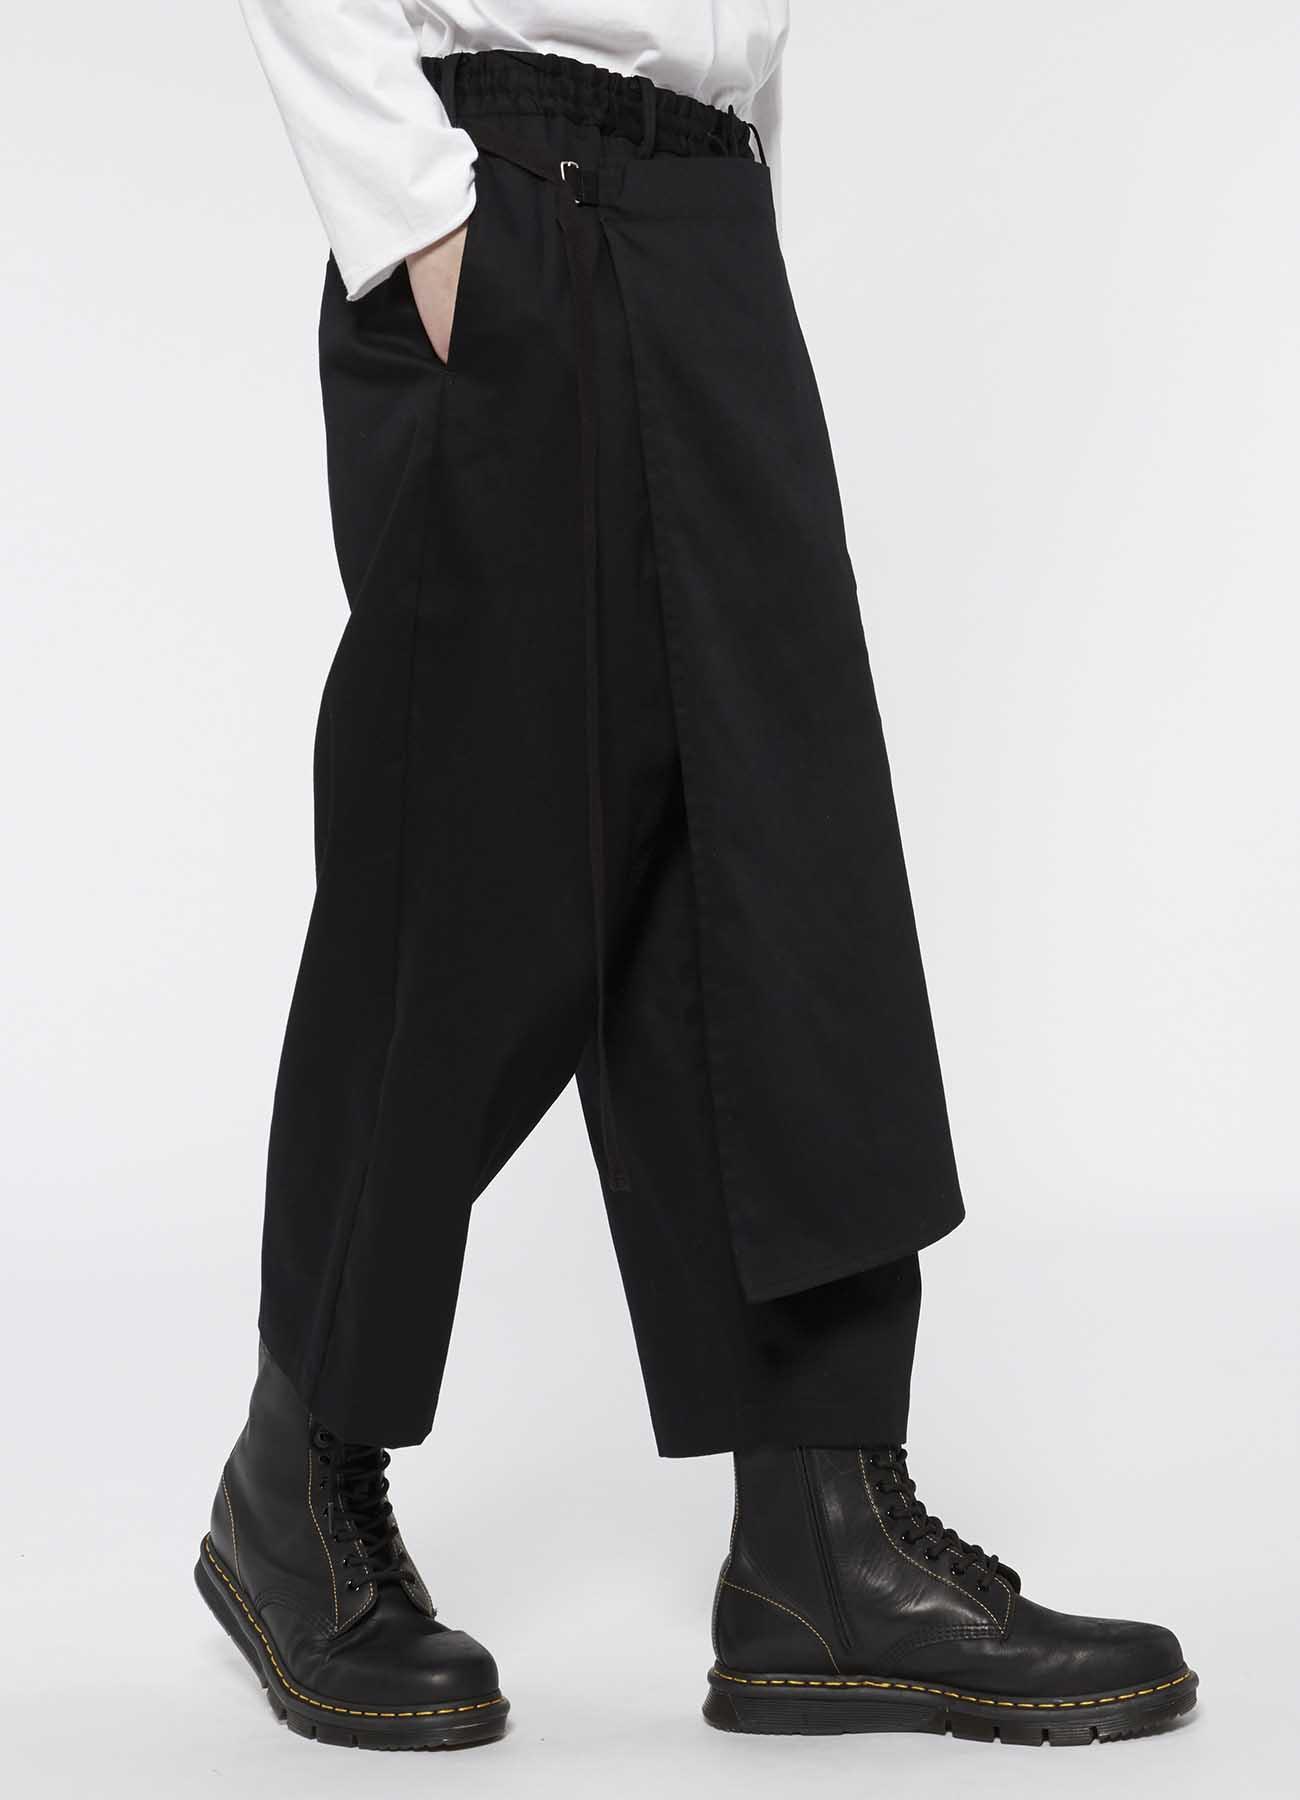 叠穿风九分裤